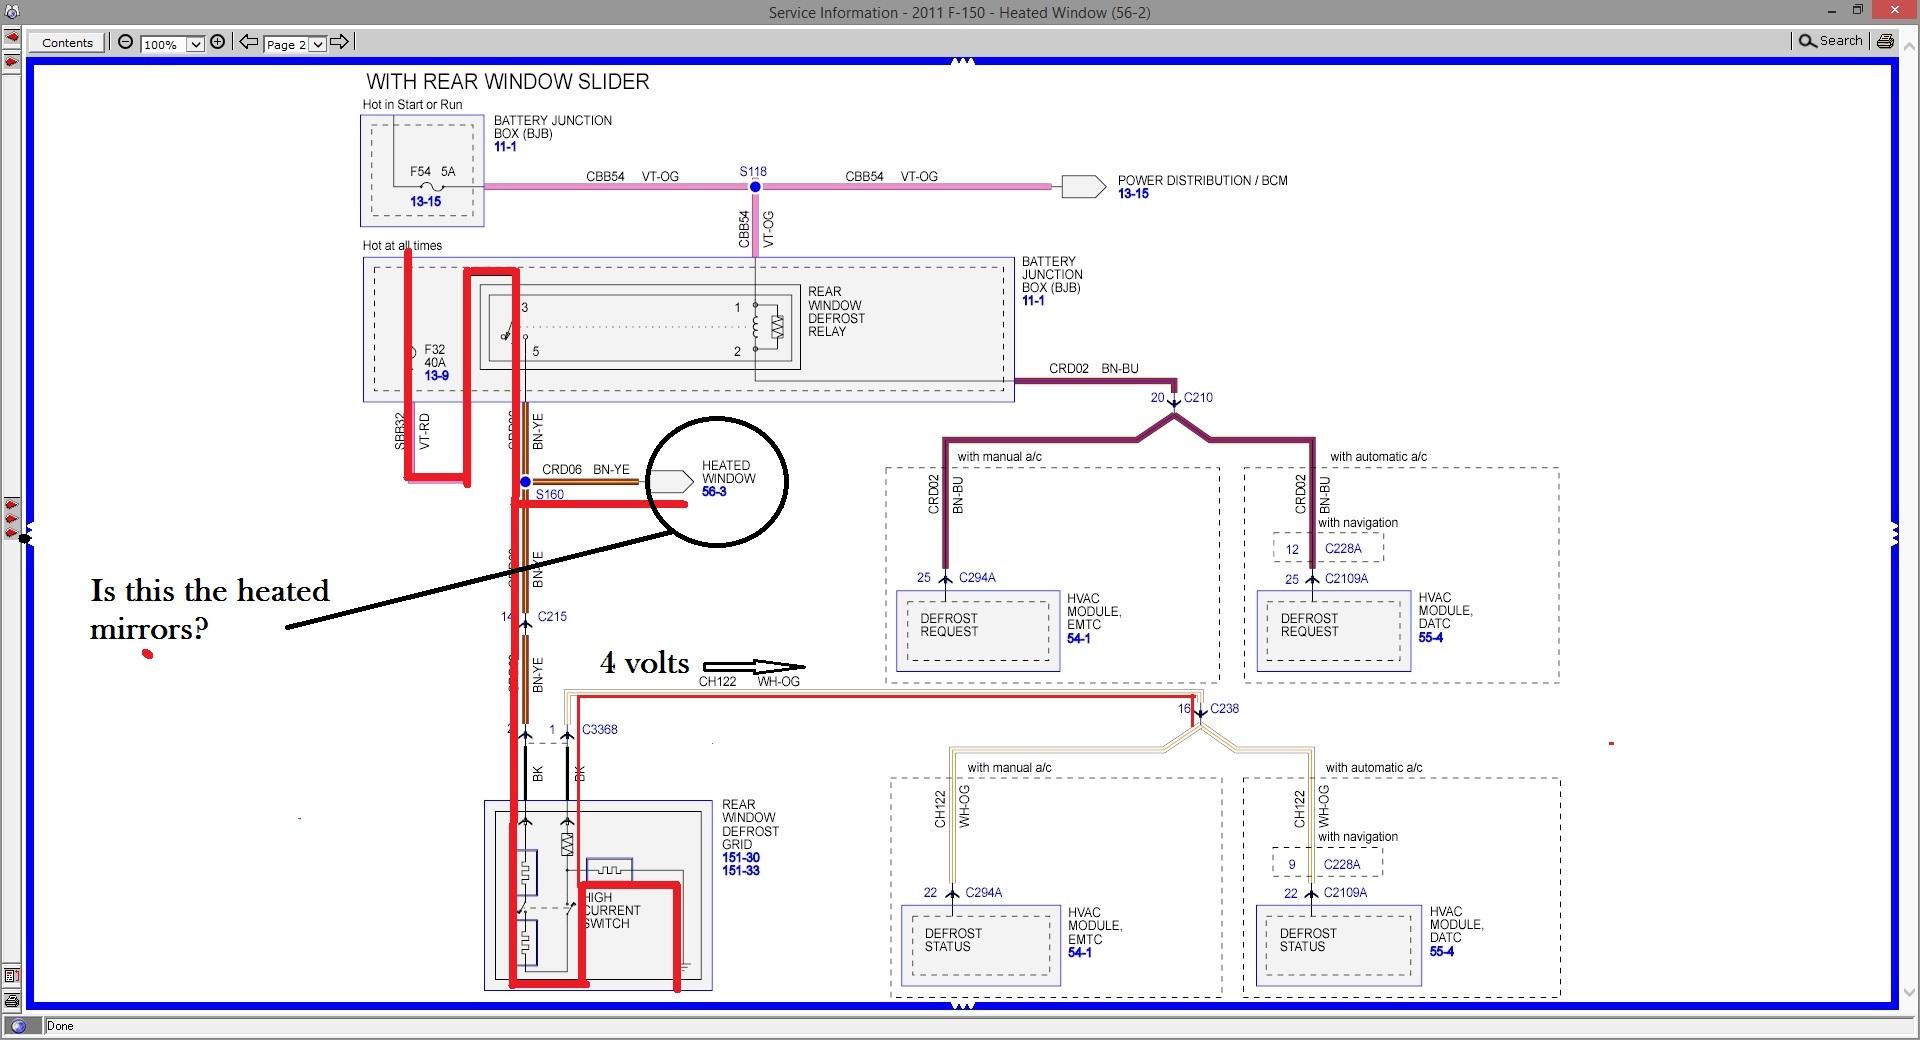 hight resolution of 2004 f150 power seat diagram 13 8 tridonicsignage de u2022power seat wiring diagram 2004 ford